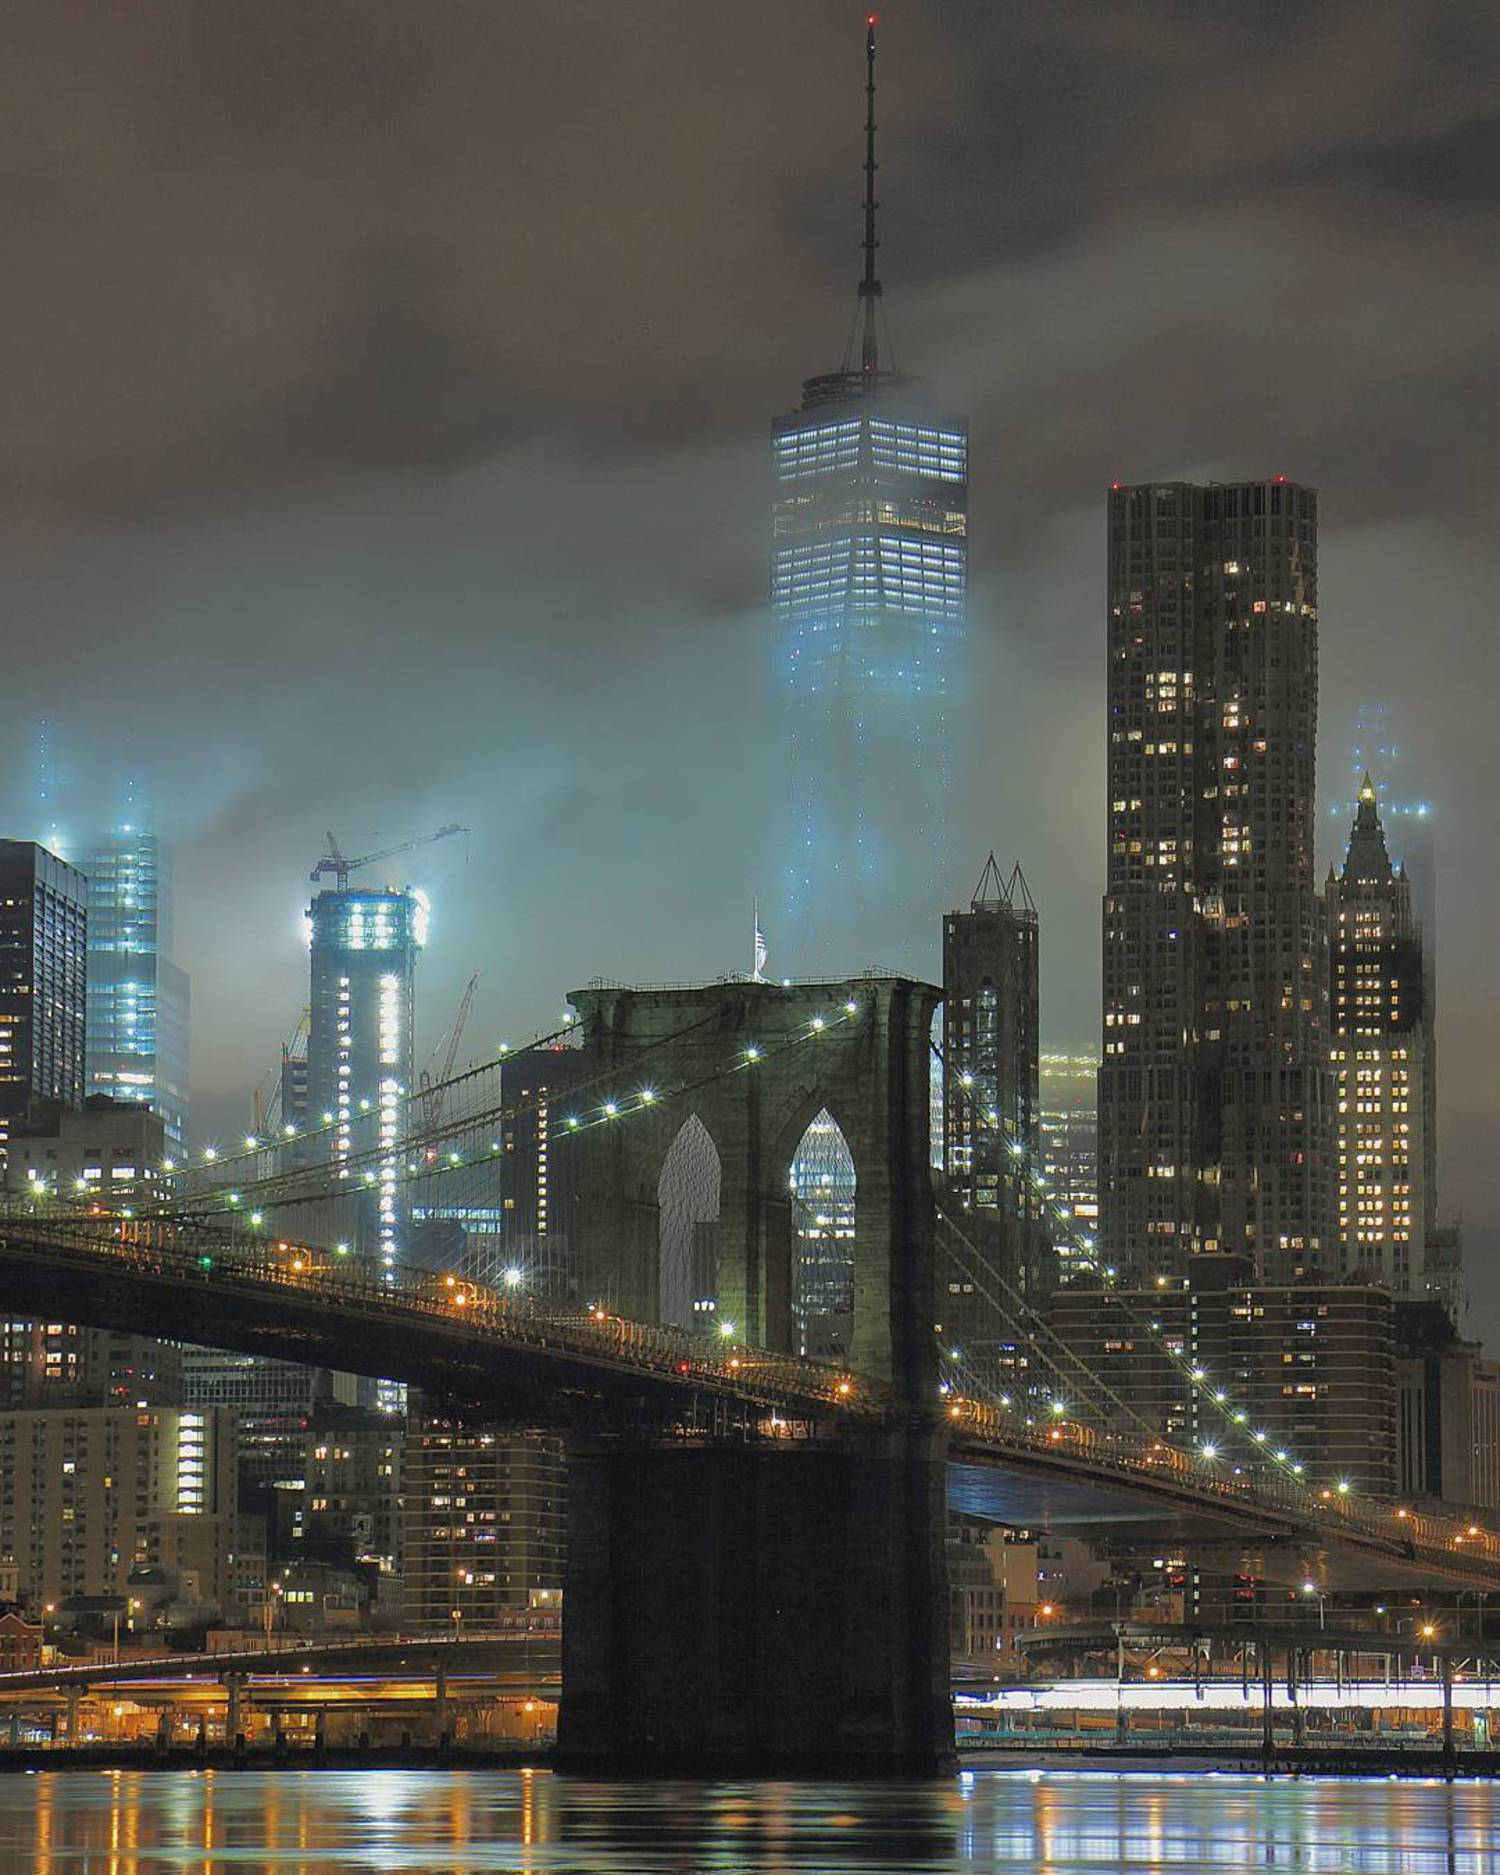 Disappearing before my very eyes ============================= #nycprimeshot #usa_primeshot #ic_thecity #ig_shotz #icapture_nyc #ig_great_shots  #ig_great_shots_nyc #ig_shotz_bridges #ic_longexpo #ig_unitedstates #nycbuildings #nycdotgram #instagramhub #newyorkcity #nydngram #udog_peopleandplaces #topnewyorkphoto #instagramnyc #ig_nyc #usa_greatshots #brooklynbridge #ig_podium #newyork_instagram #instagood #loves_nyc #what_i_saw_in_nyc #welovethiscity #nightshooters #nightlongexposure #igs_america